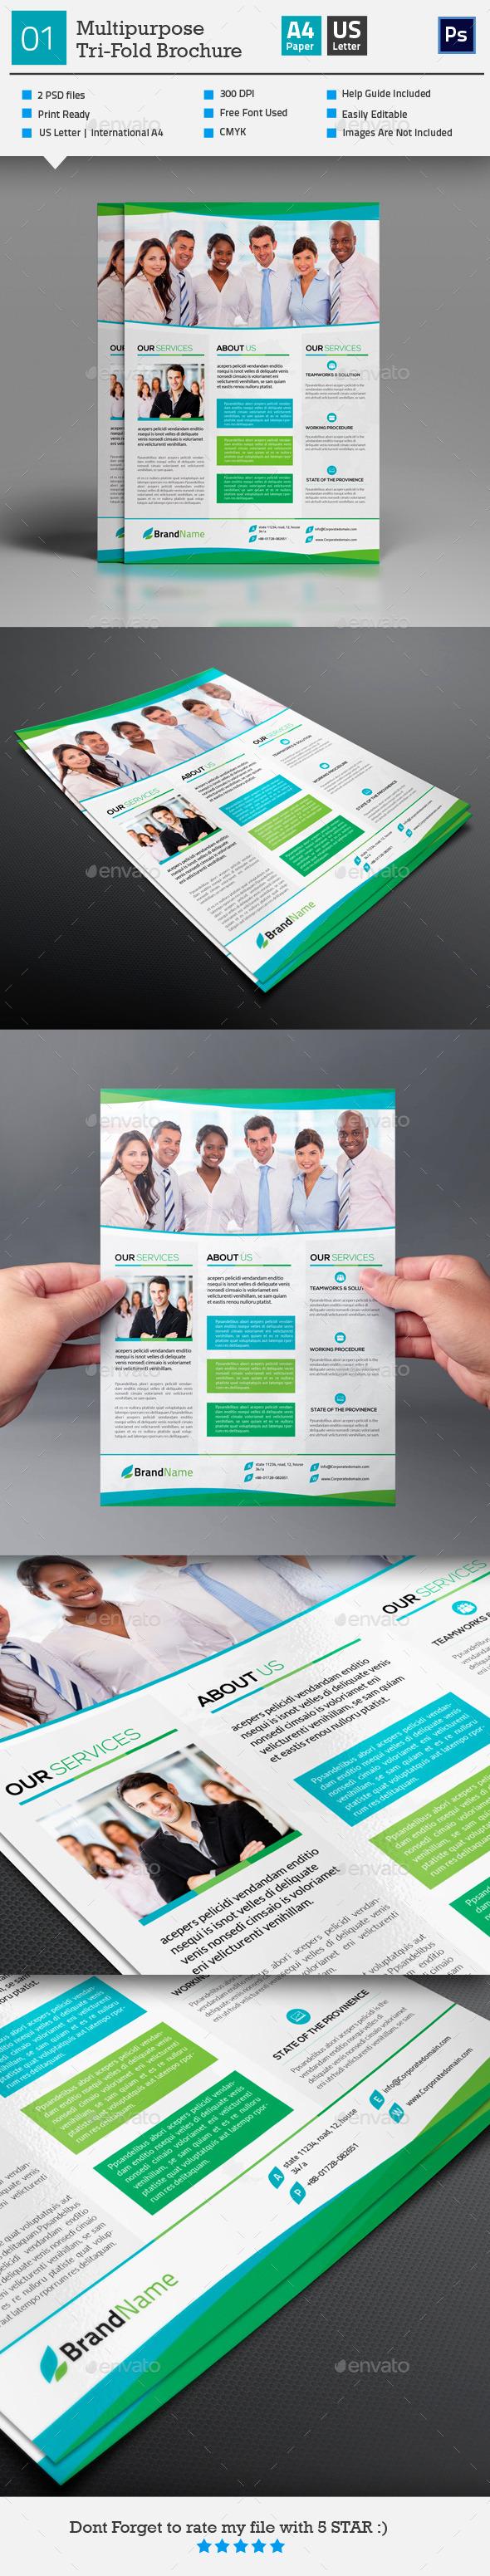 GraphicRiver Multipurpose Flyer Template 01 10305724